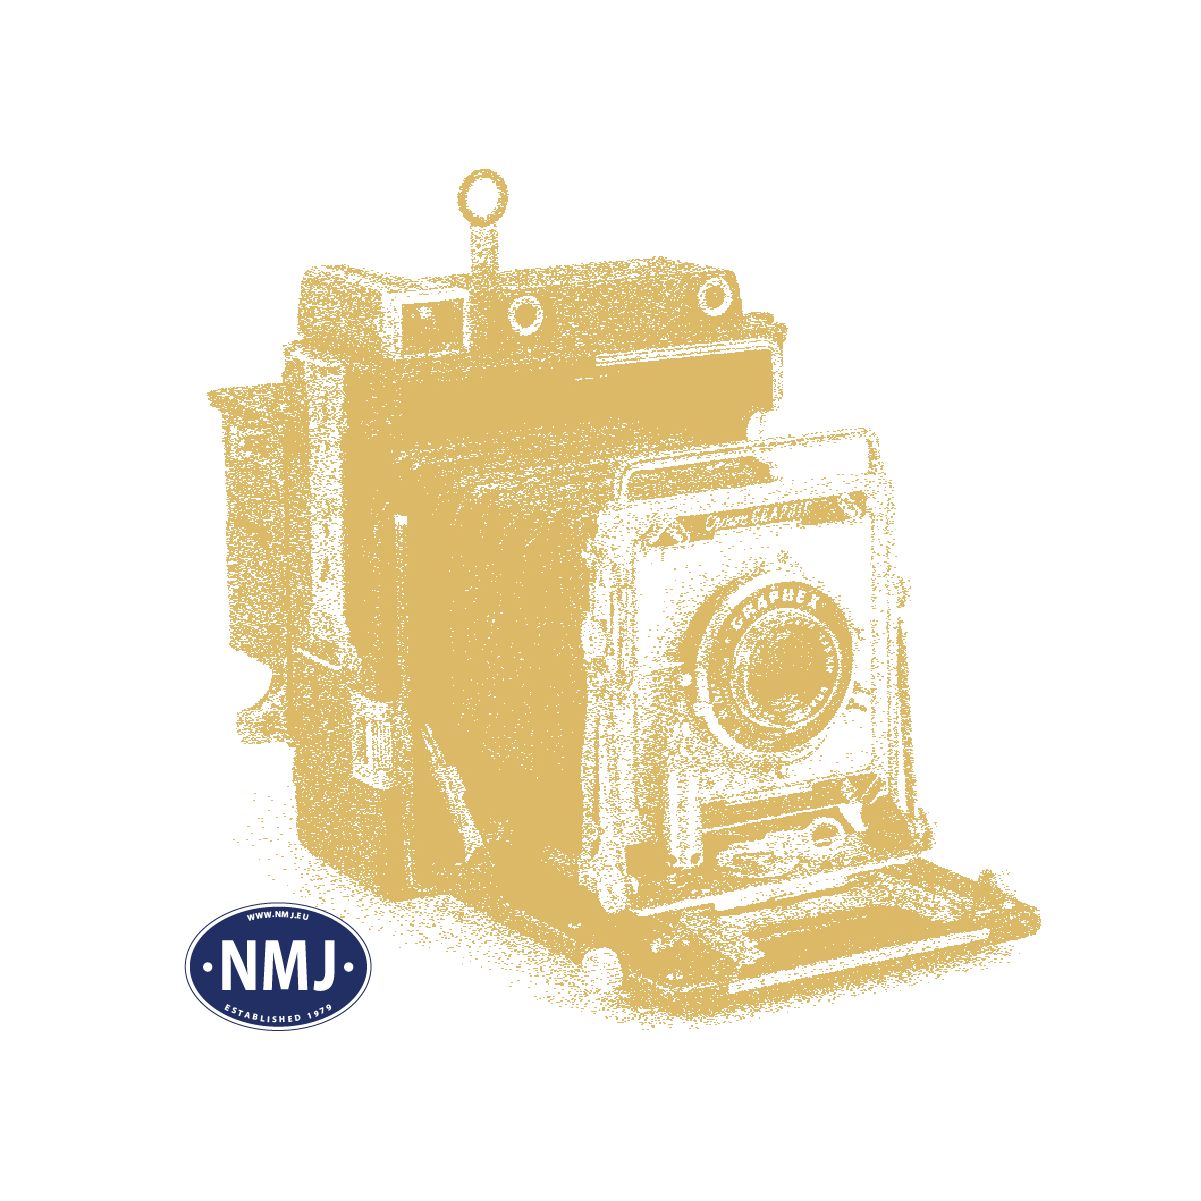 NMJST310591 - NMJ Superline NSB T3 10591 Stakevogn m/ Bremseplattform, *NMJ 40 ÅR*